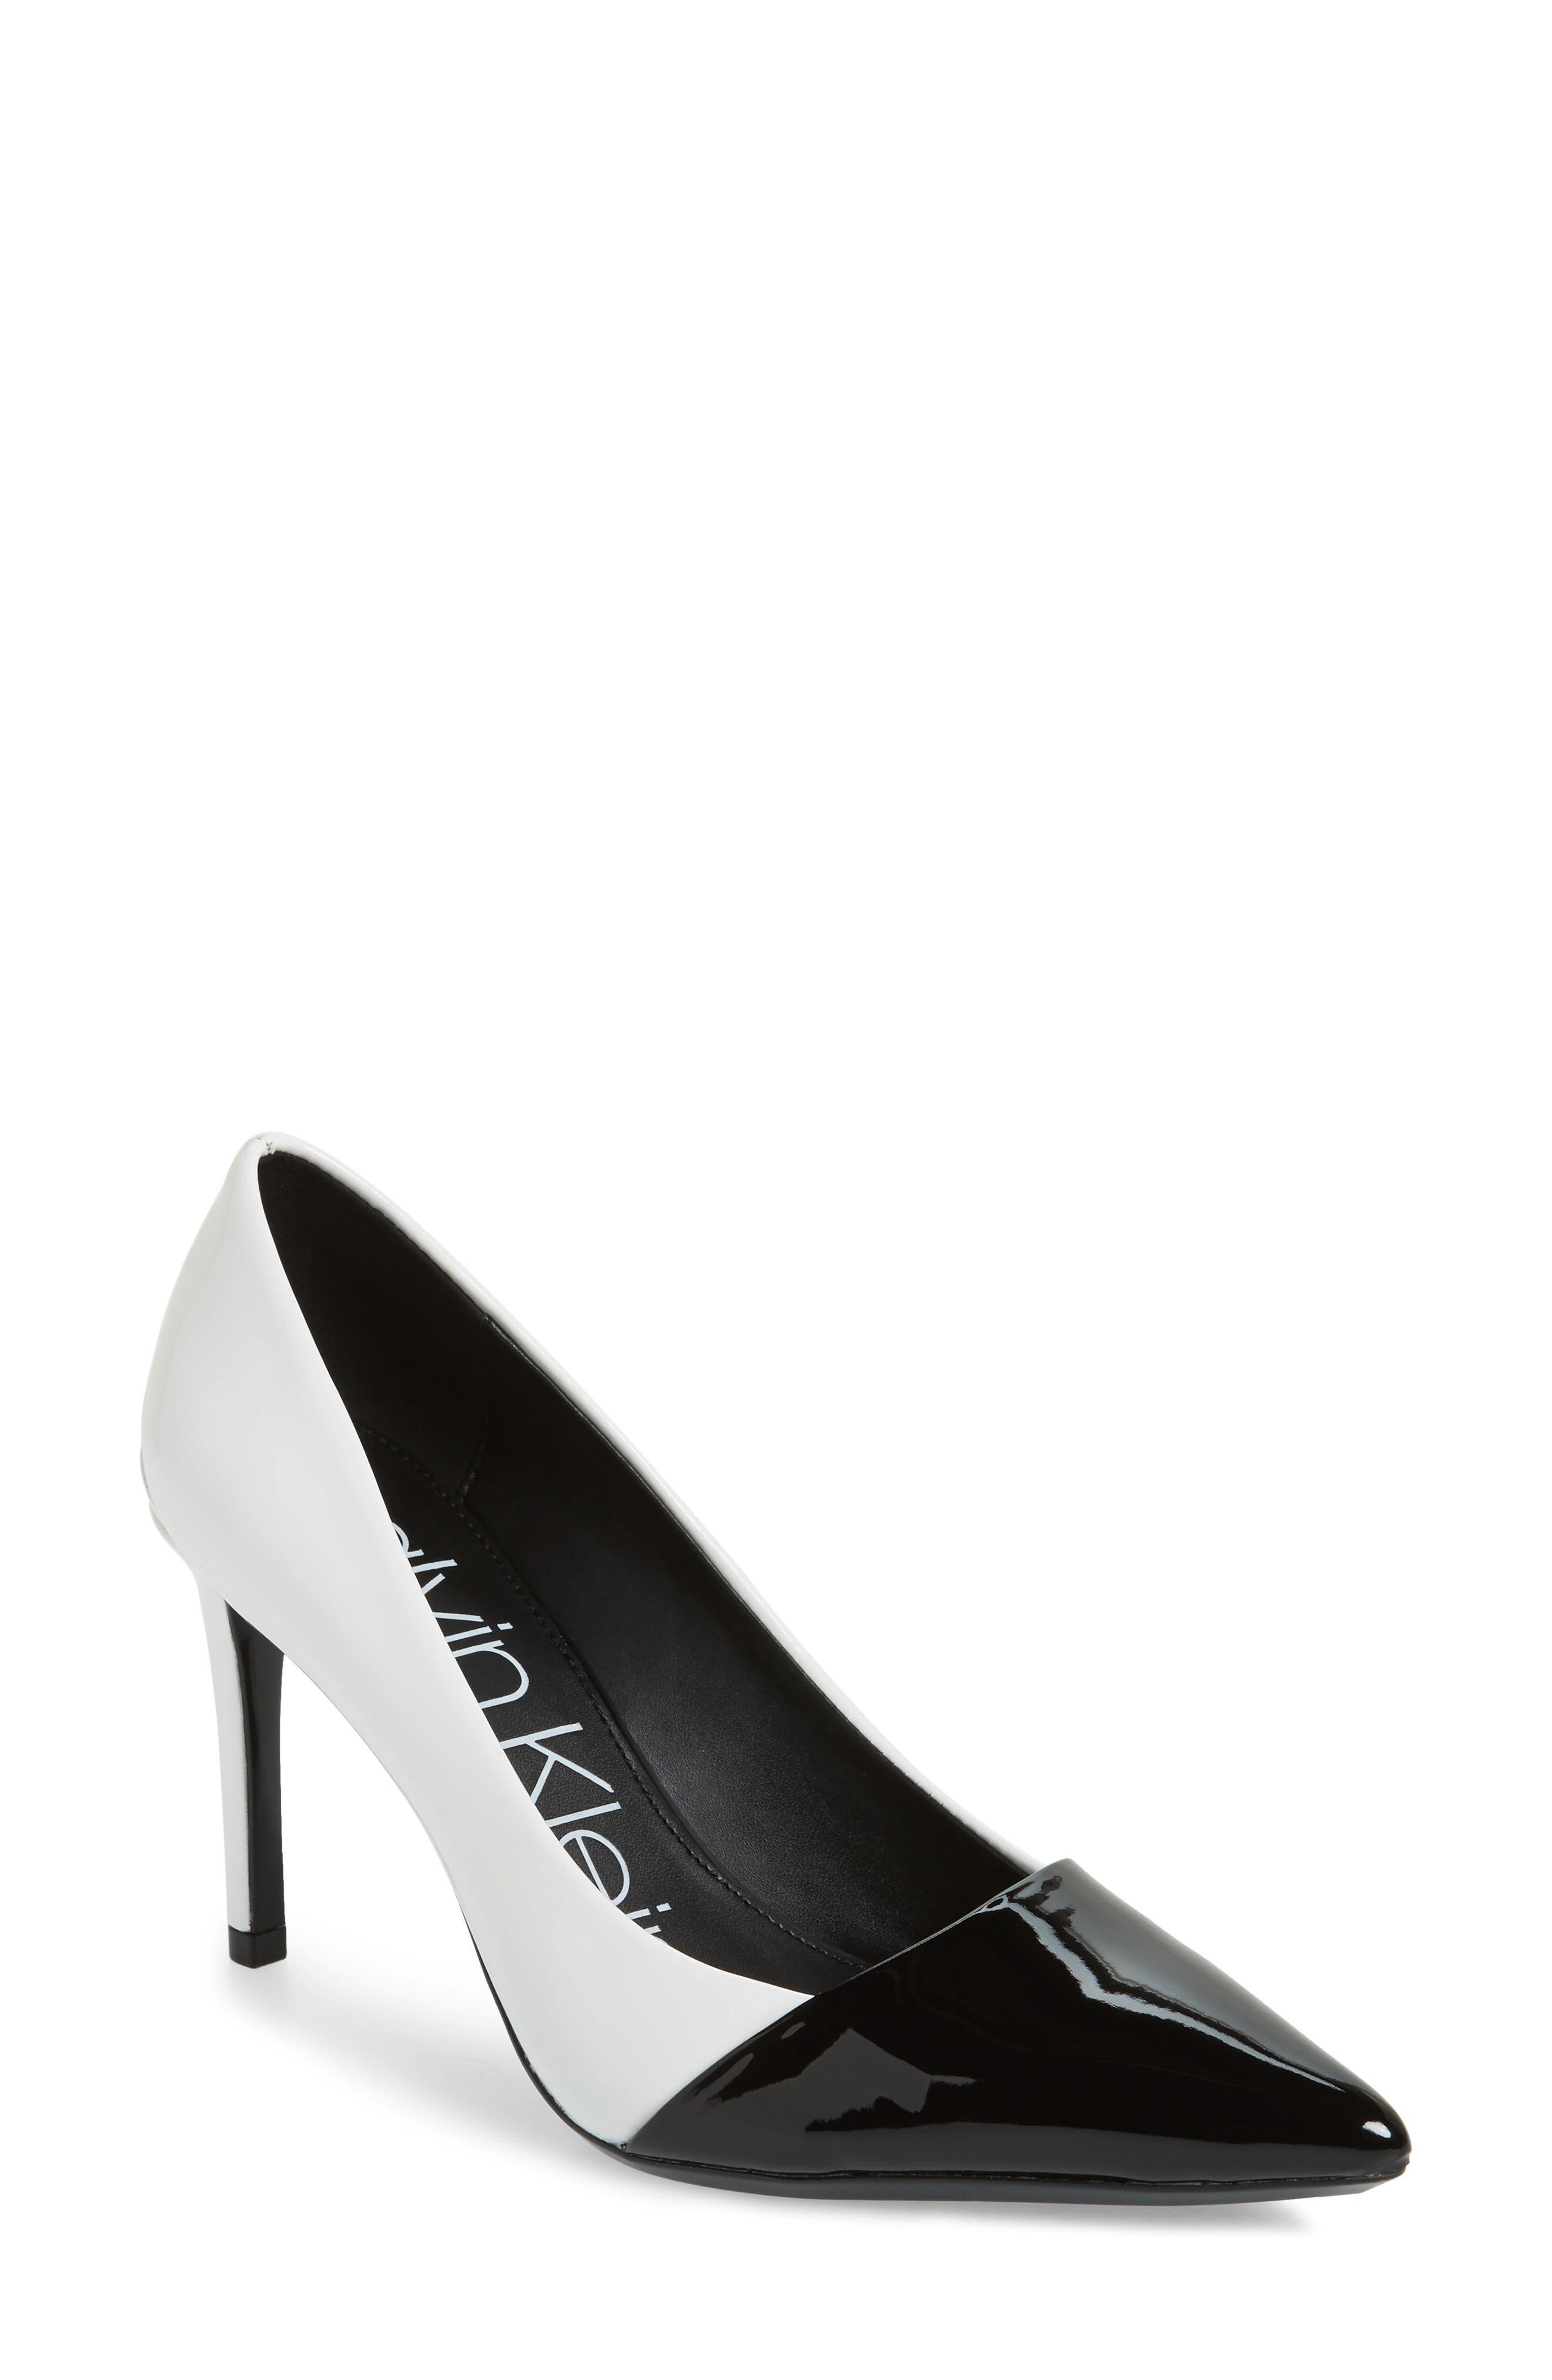 CALVIN KLEIN Roslyn, Platinum White/Black Patent Smooth/Patent